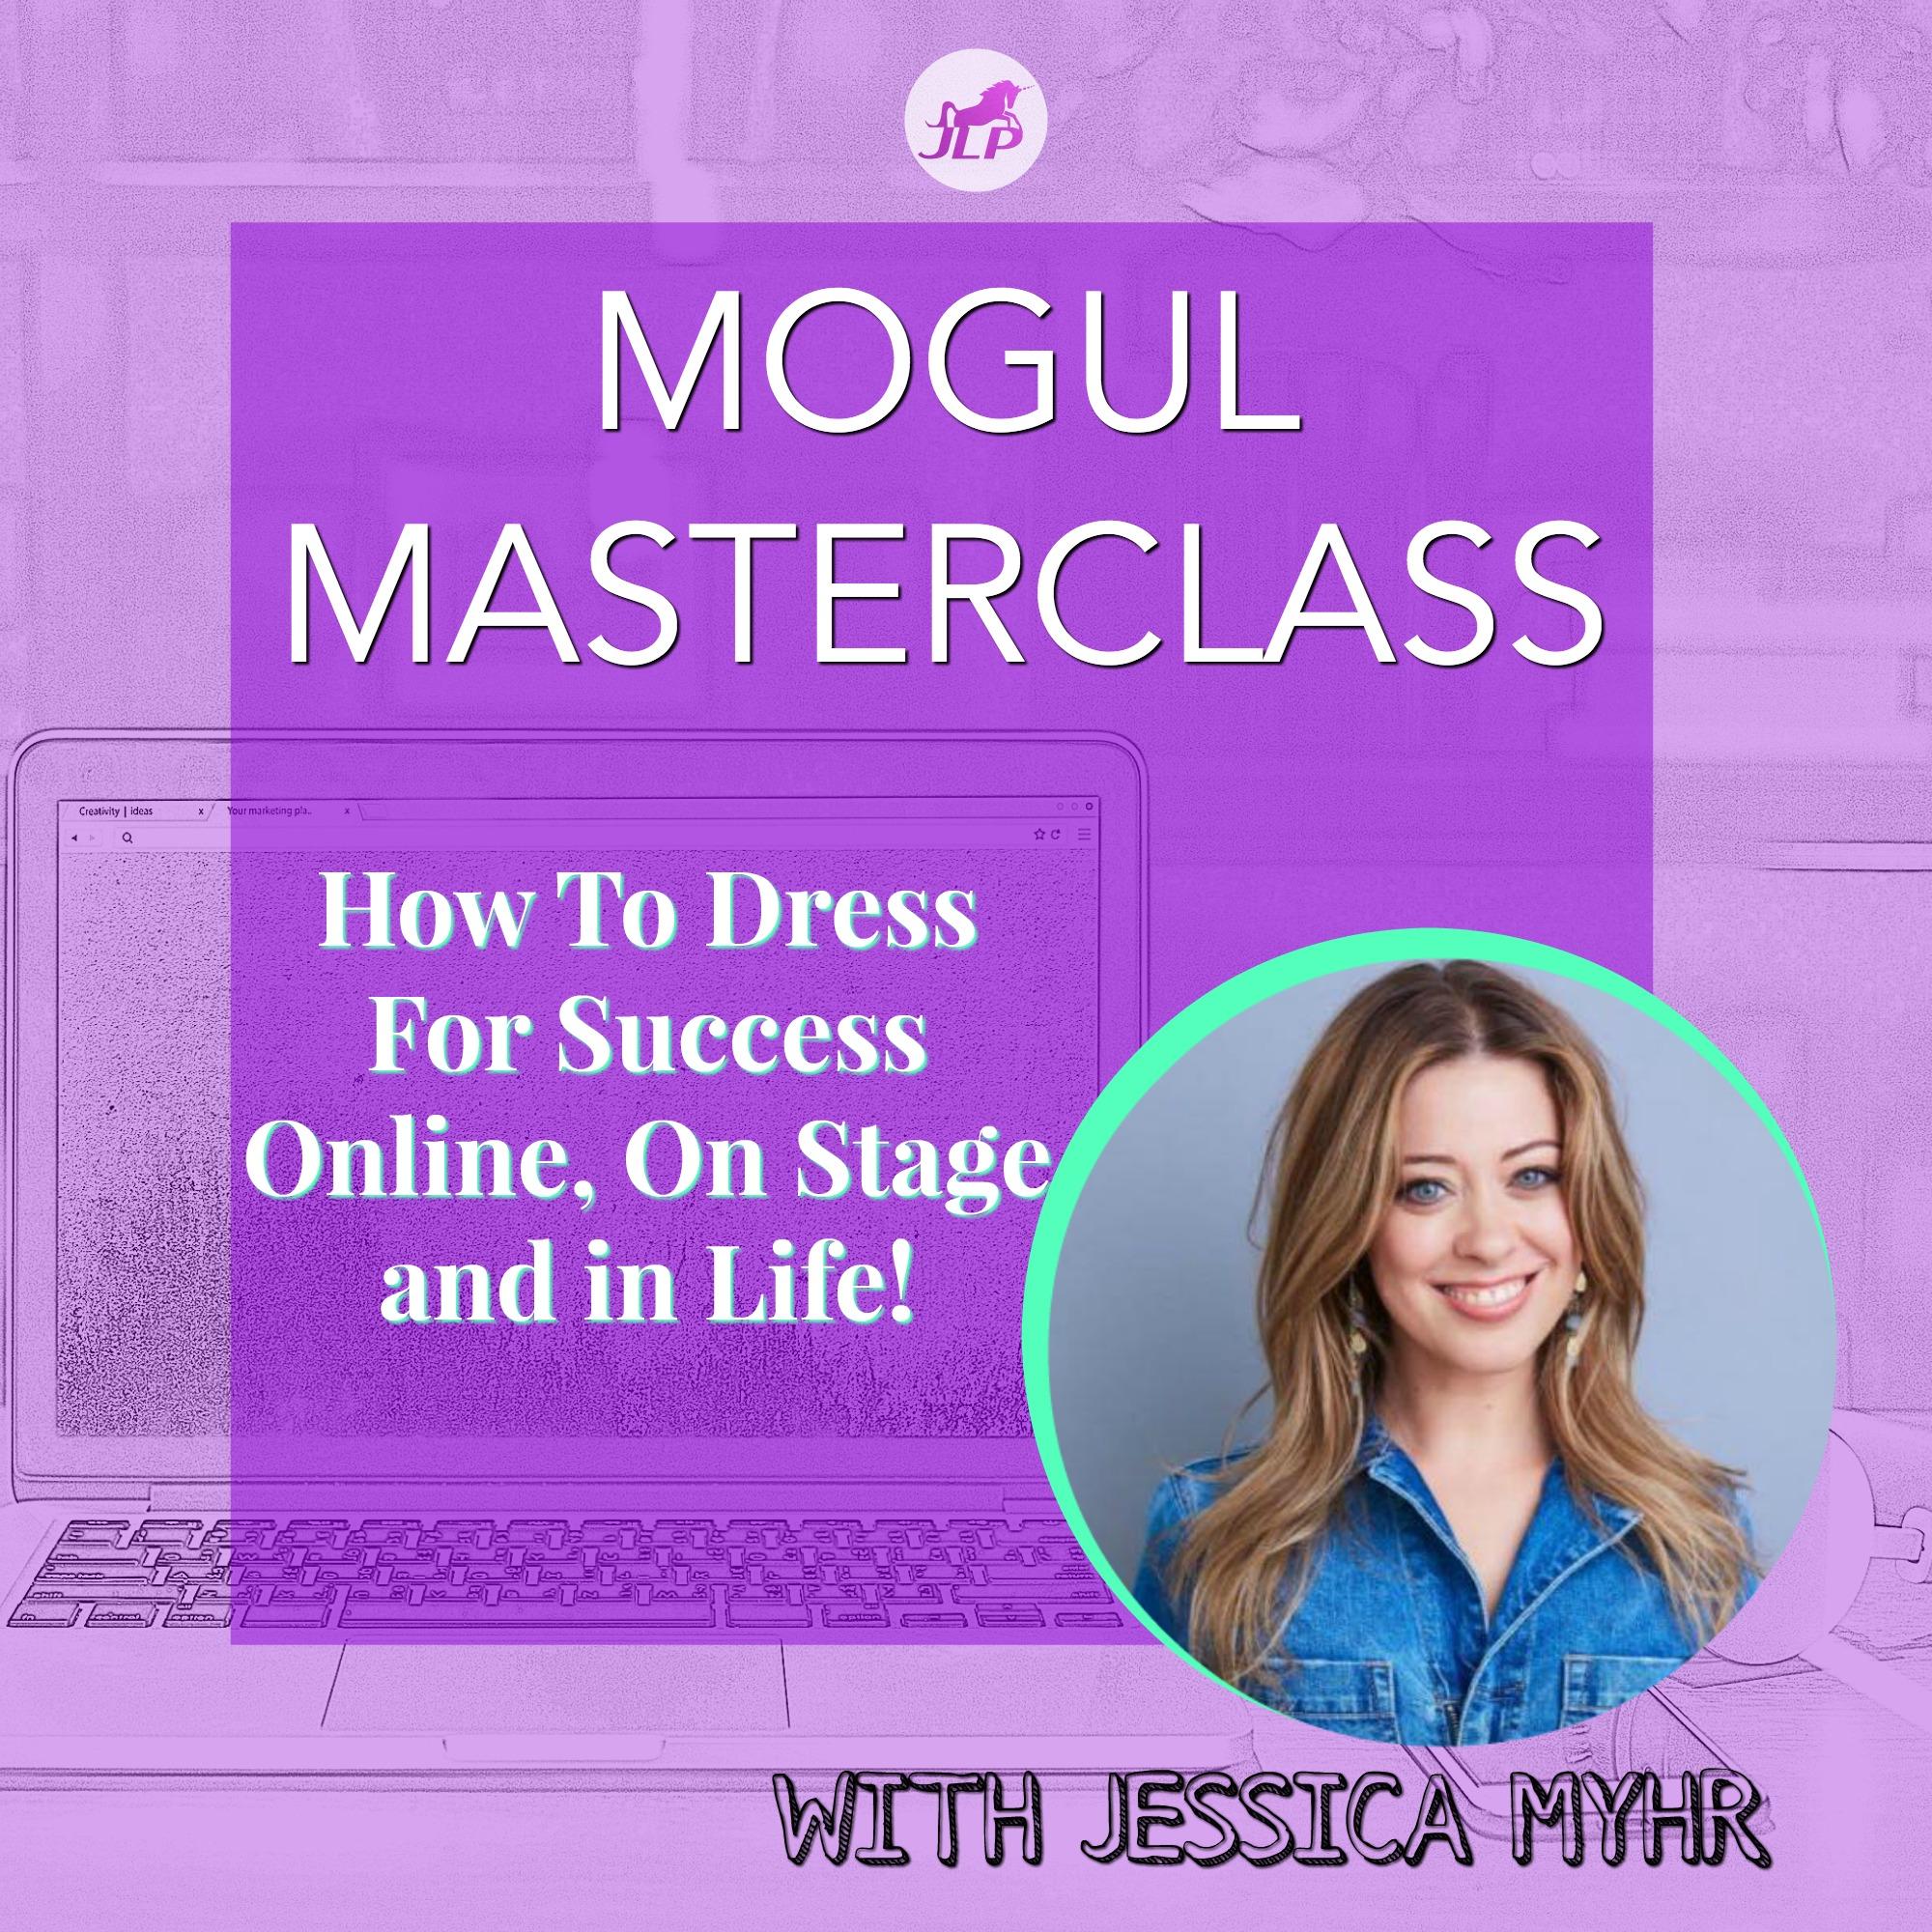 March_Mogul_Masterclass_JessicaMyhr.jpg